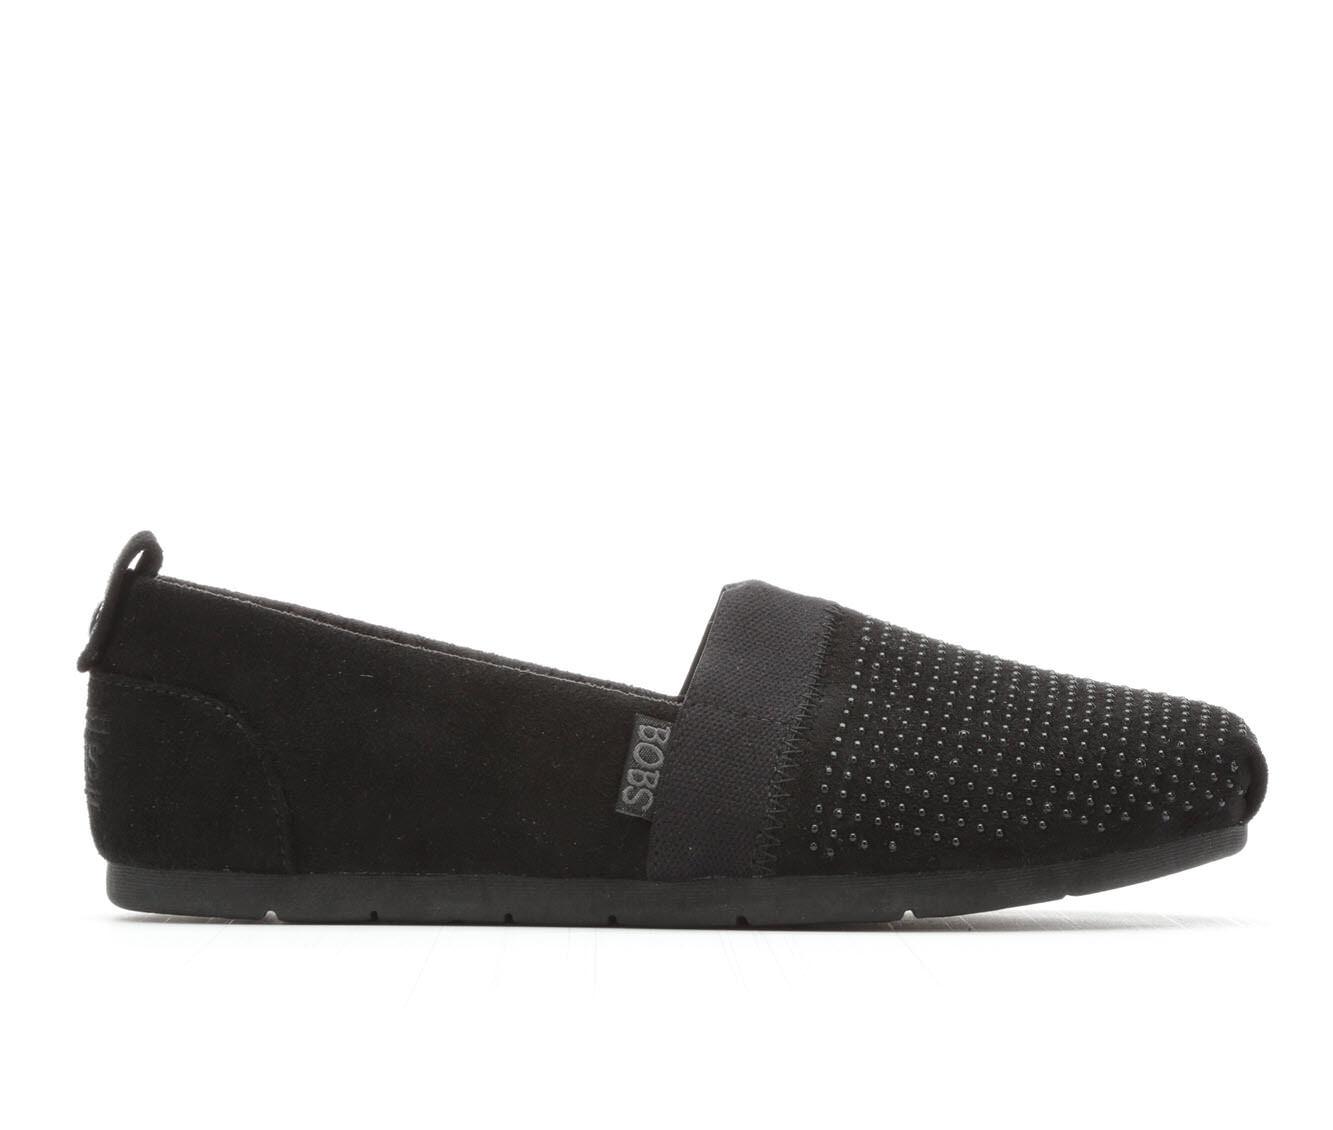 bobs shoes Black